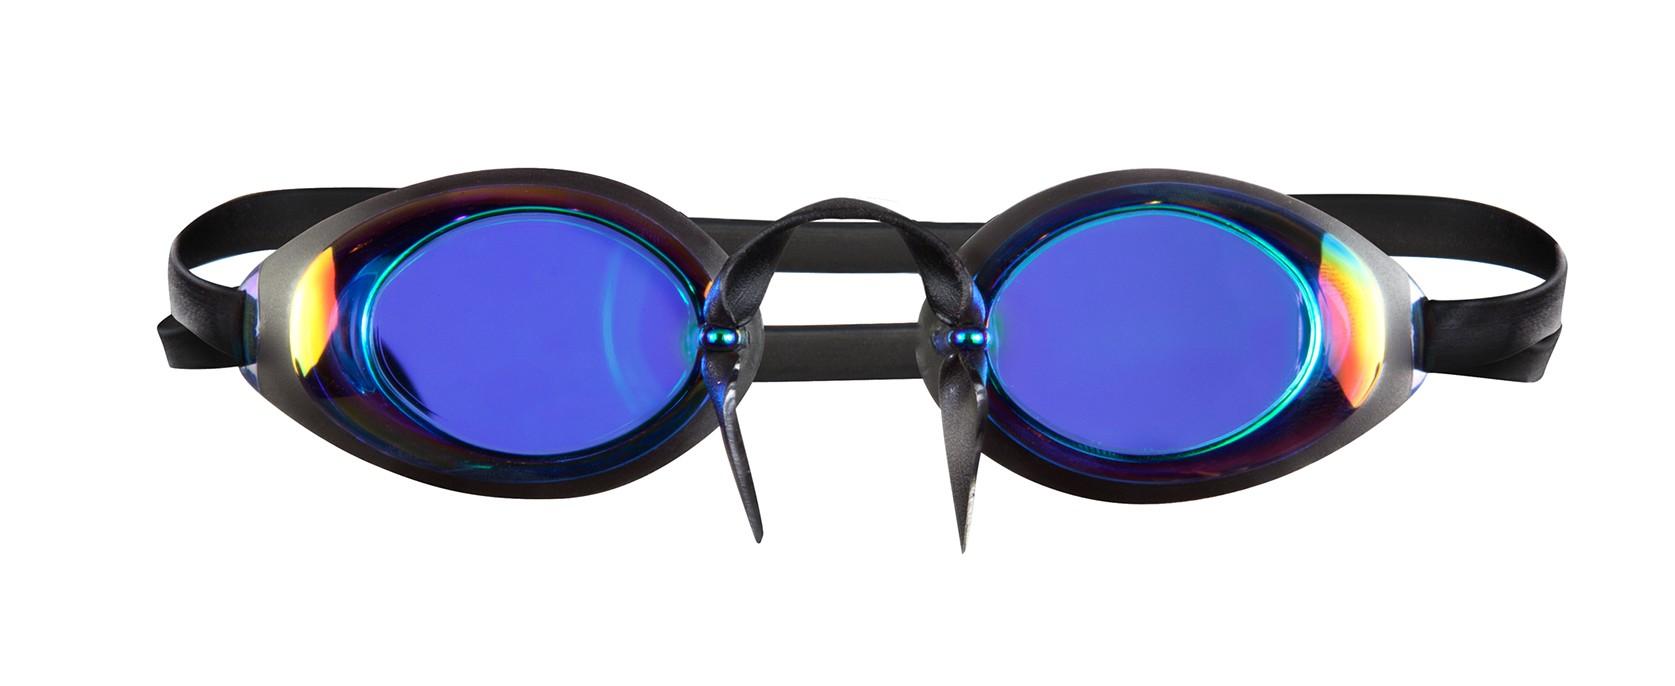 Goggles clipart googles. Free cliparts swimming google